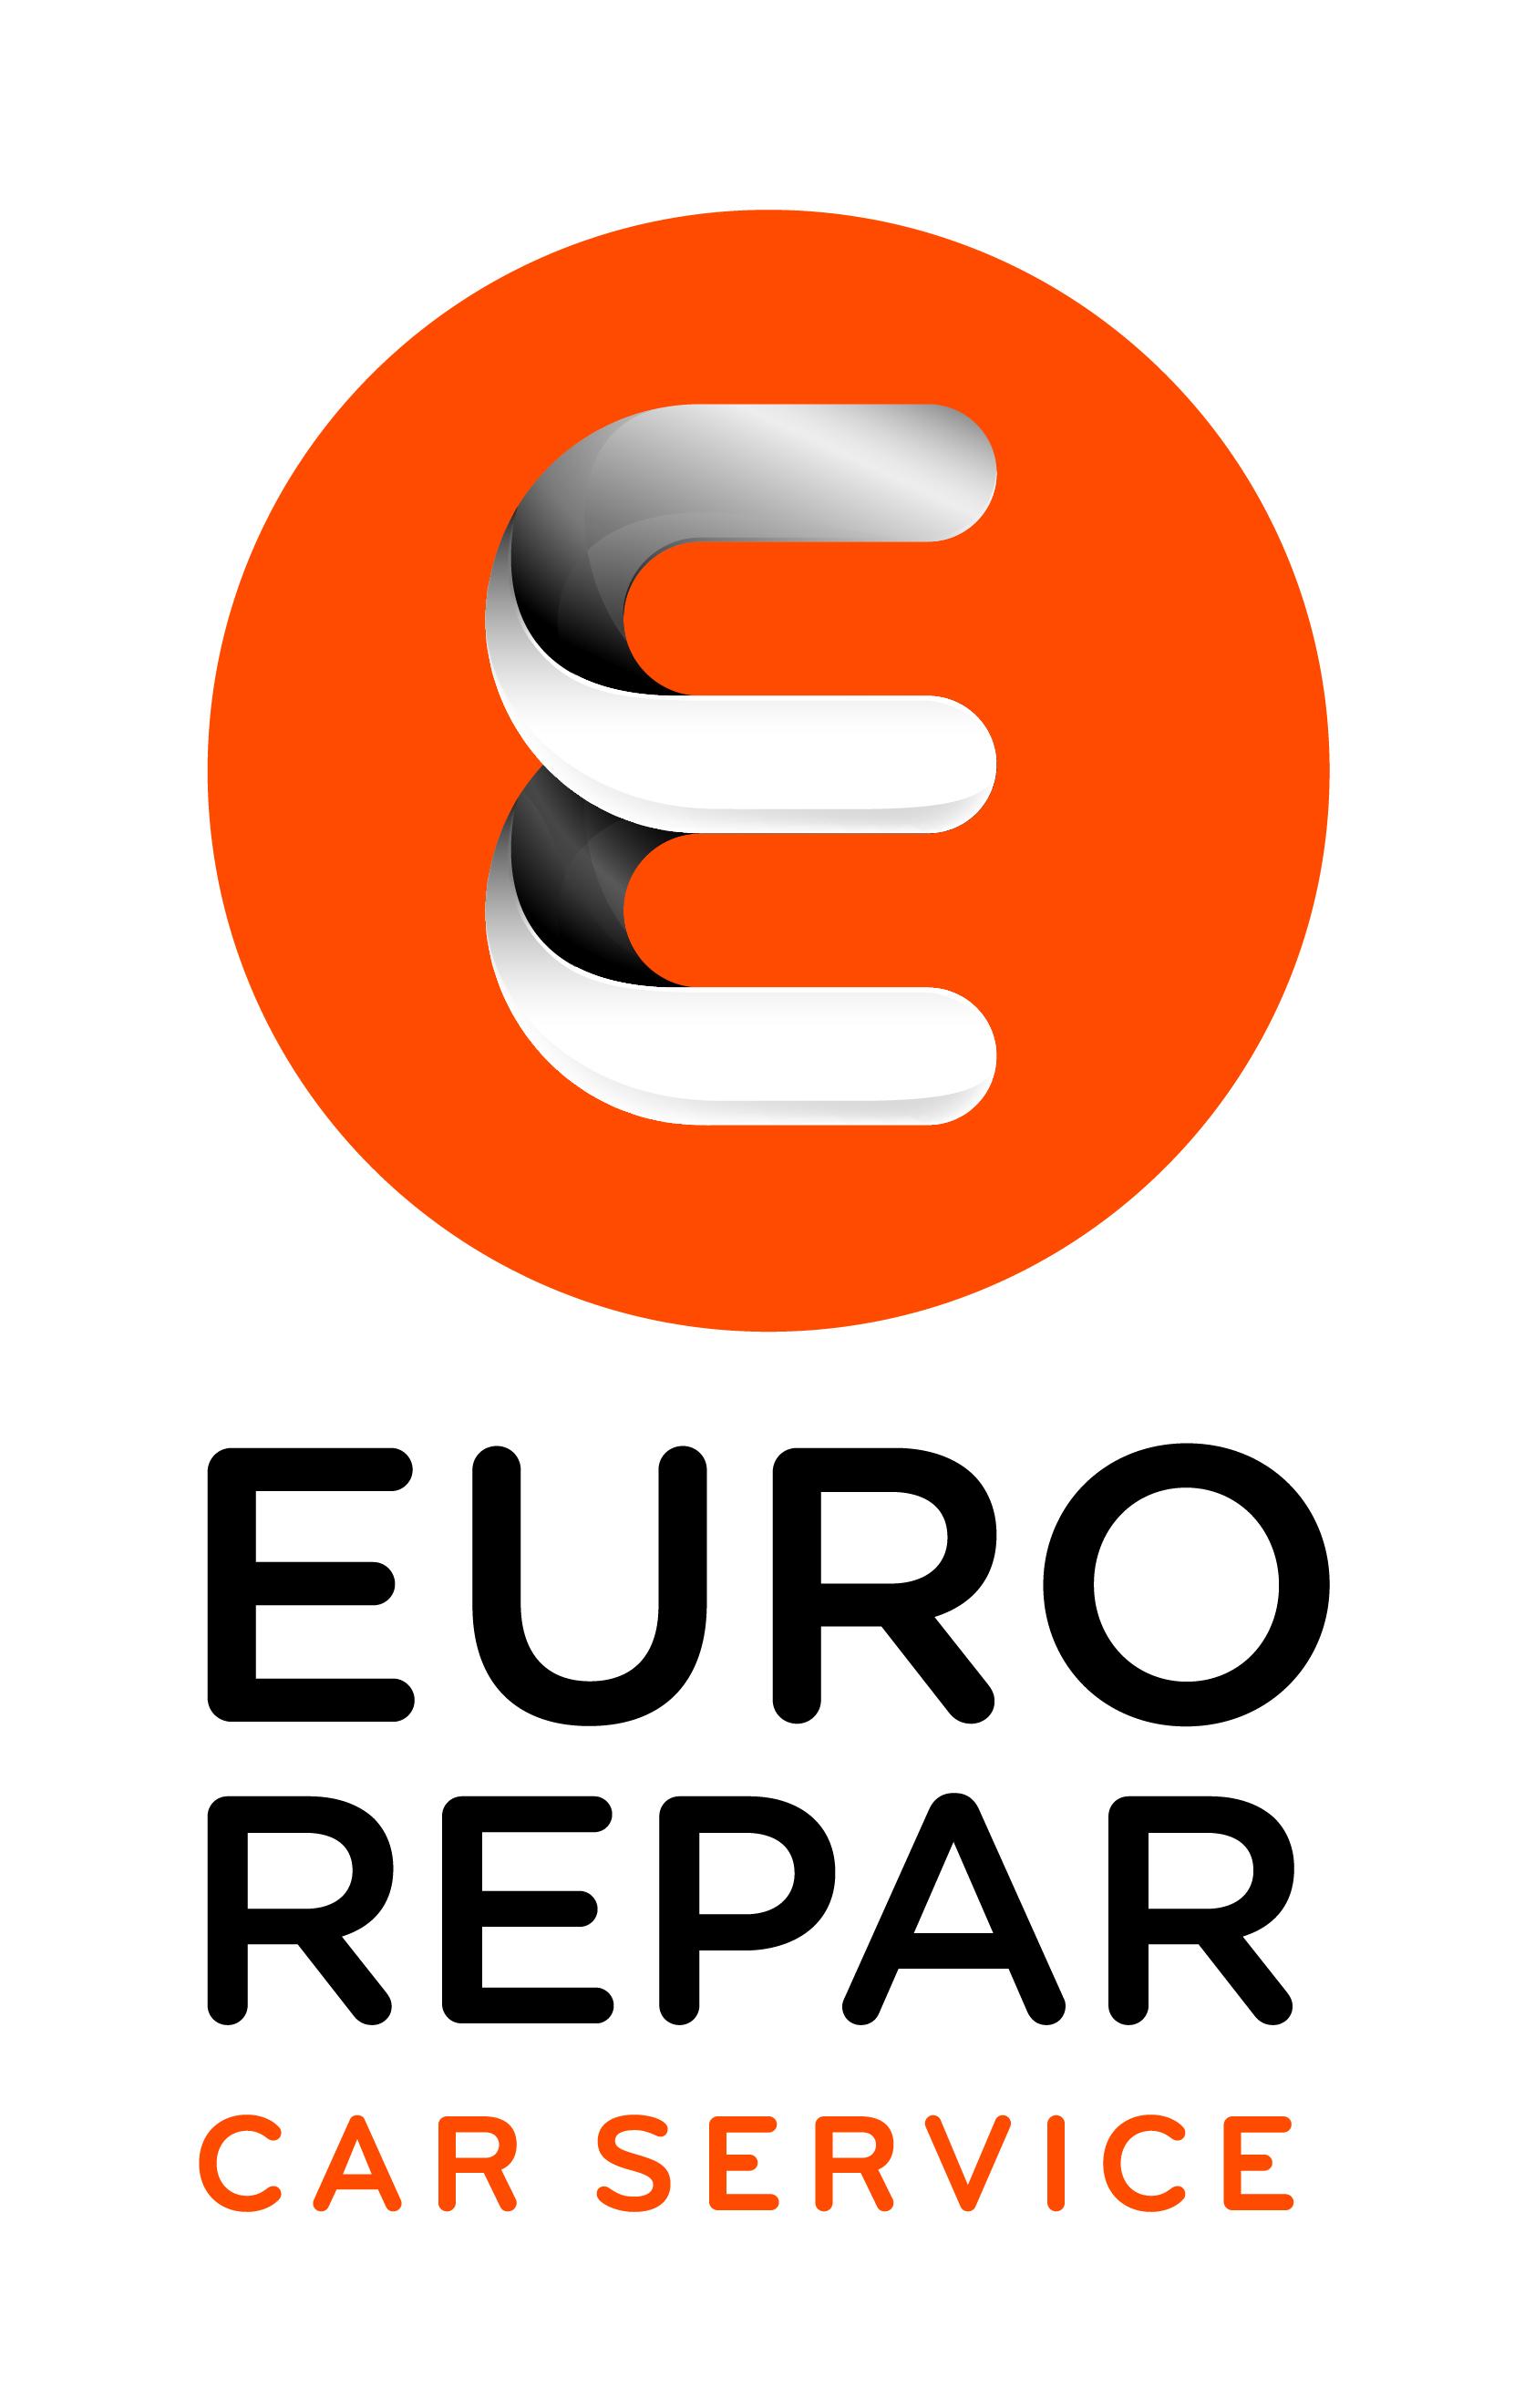 EURO REPAR - GABLIN AUTO logo